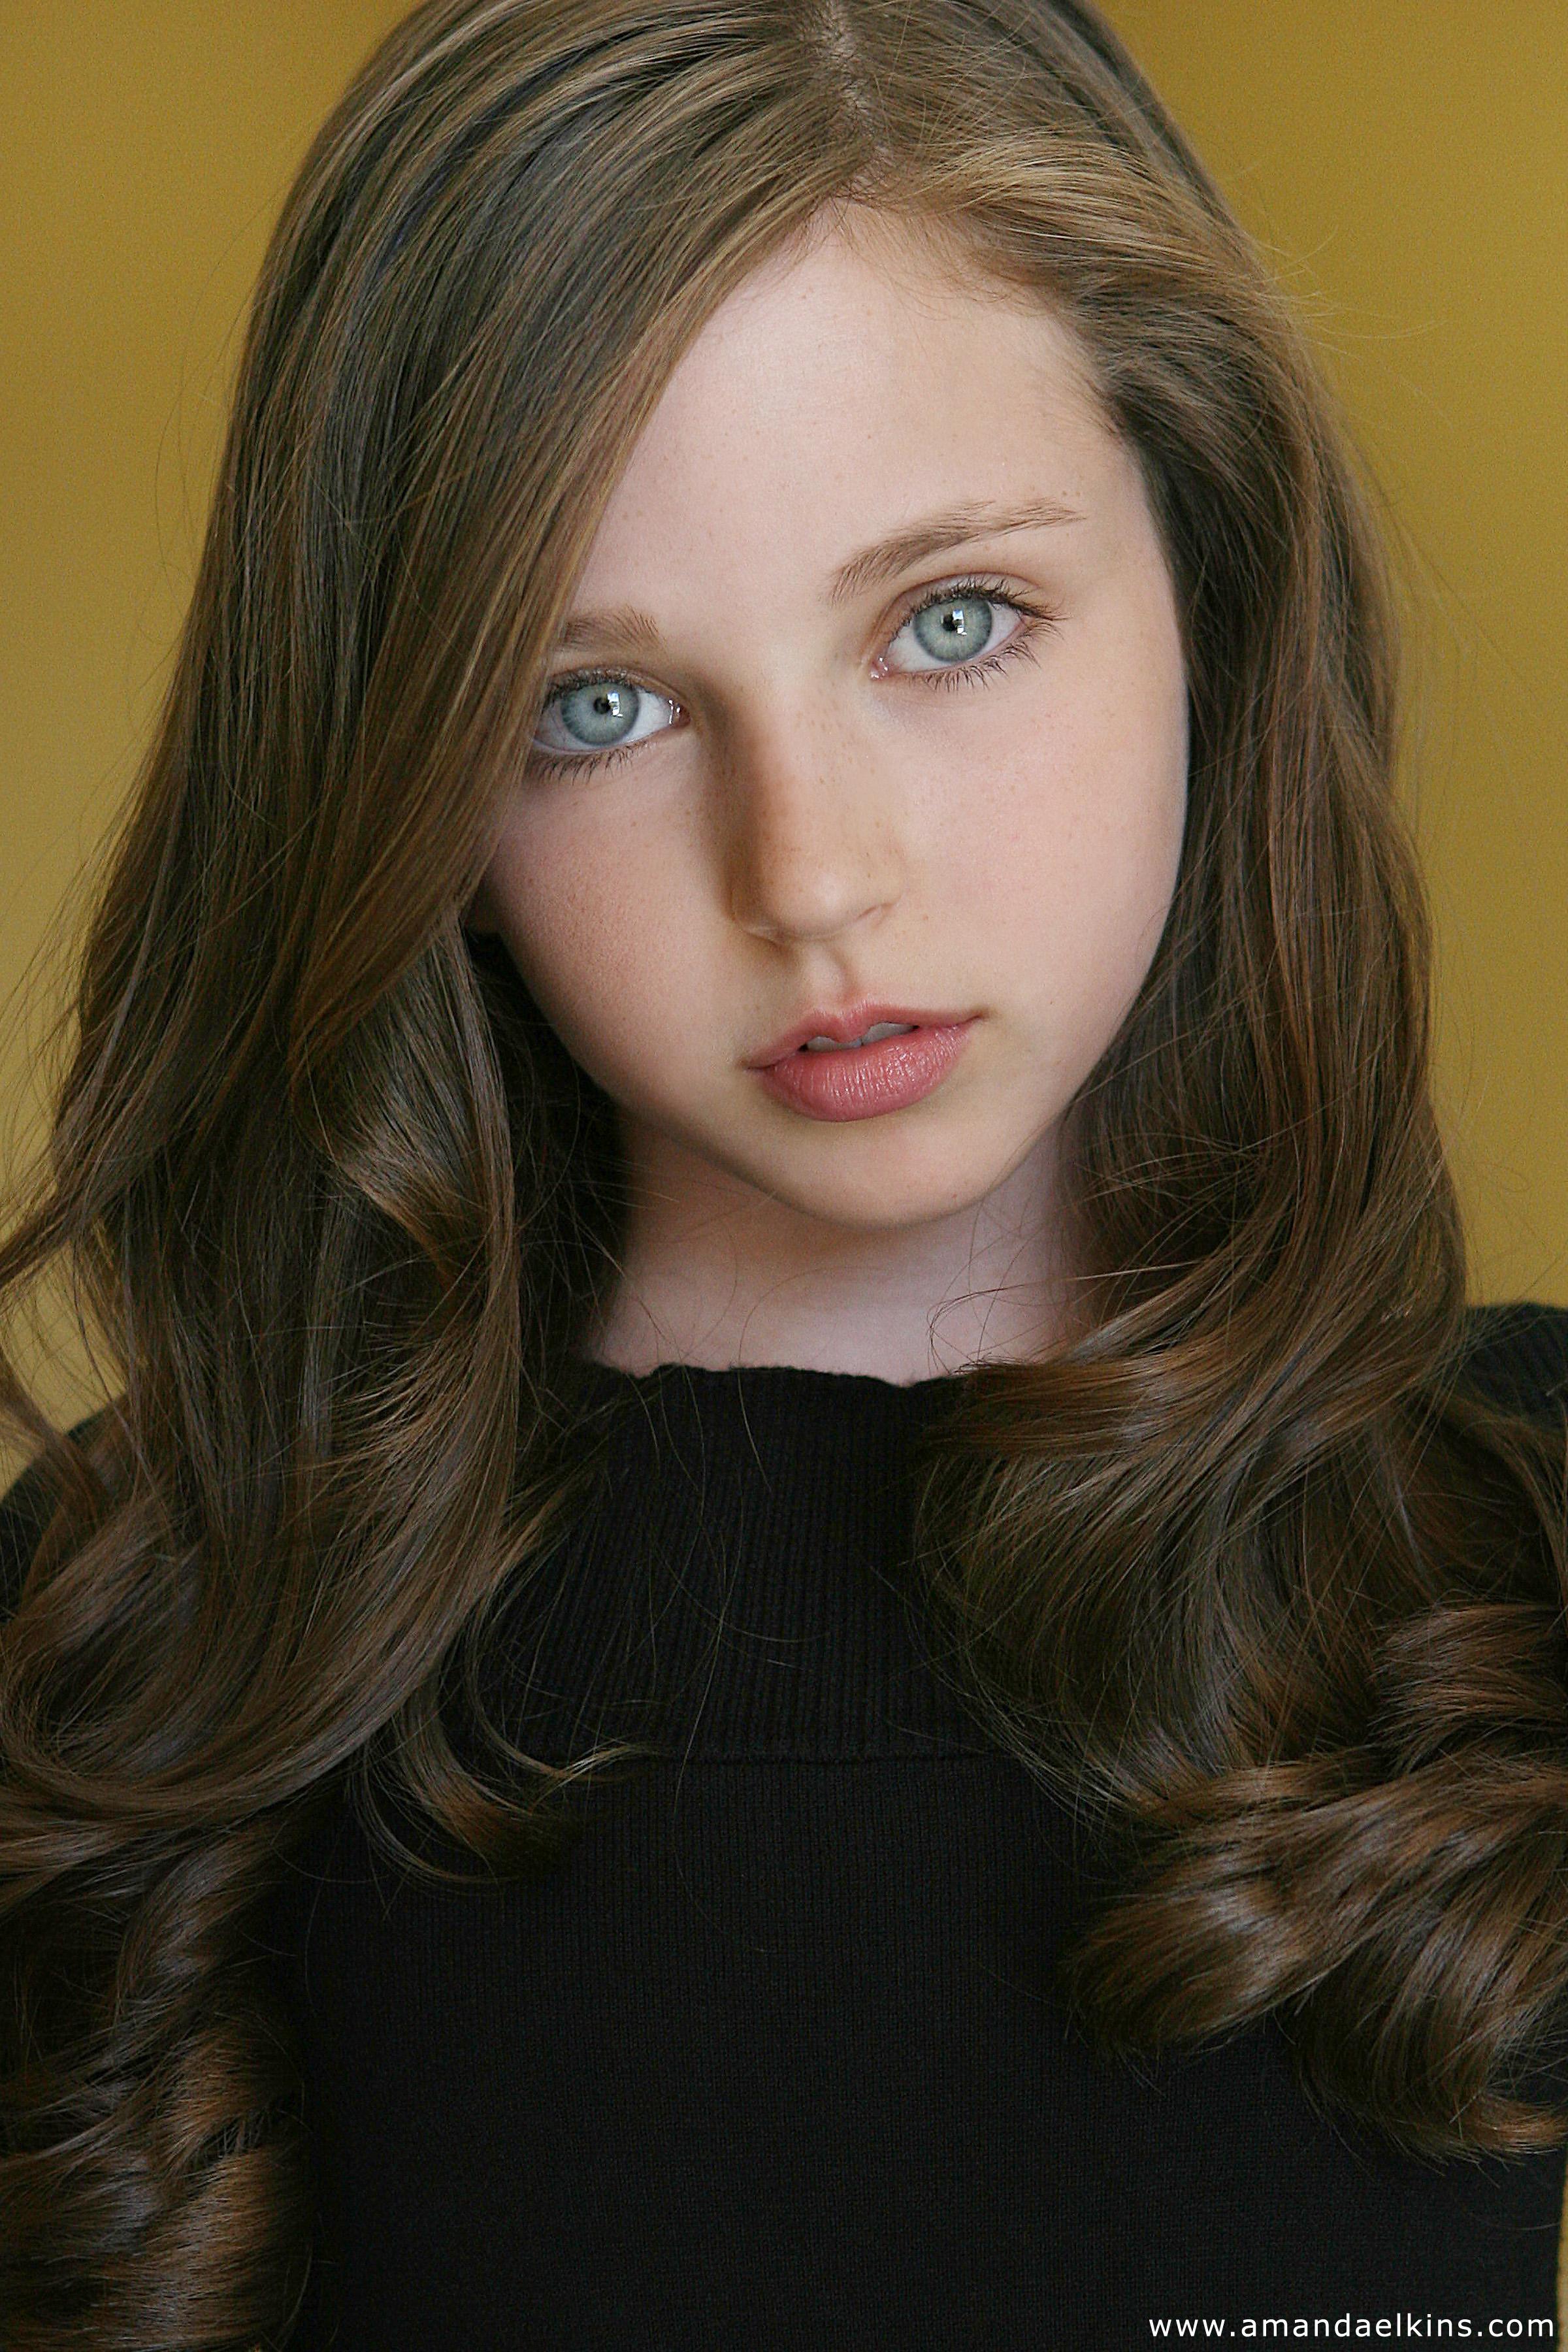 Симпатичная девочка фото 10 фотография